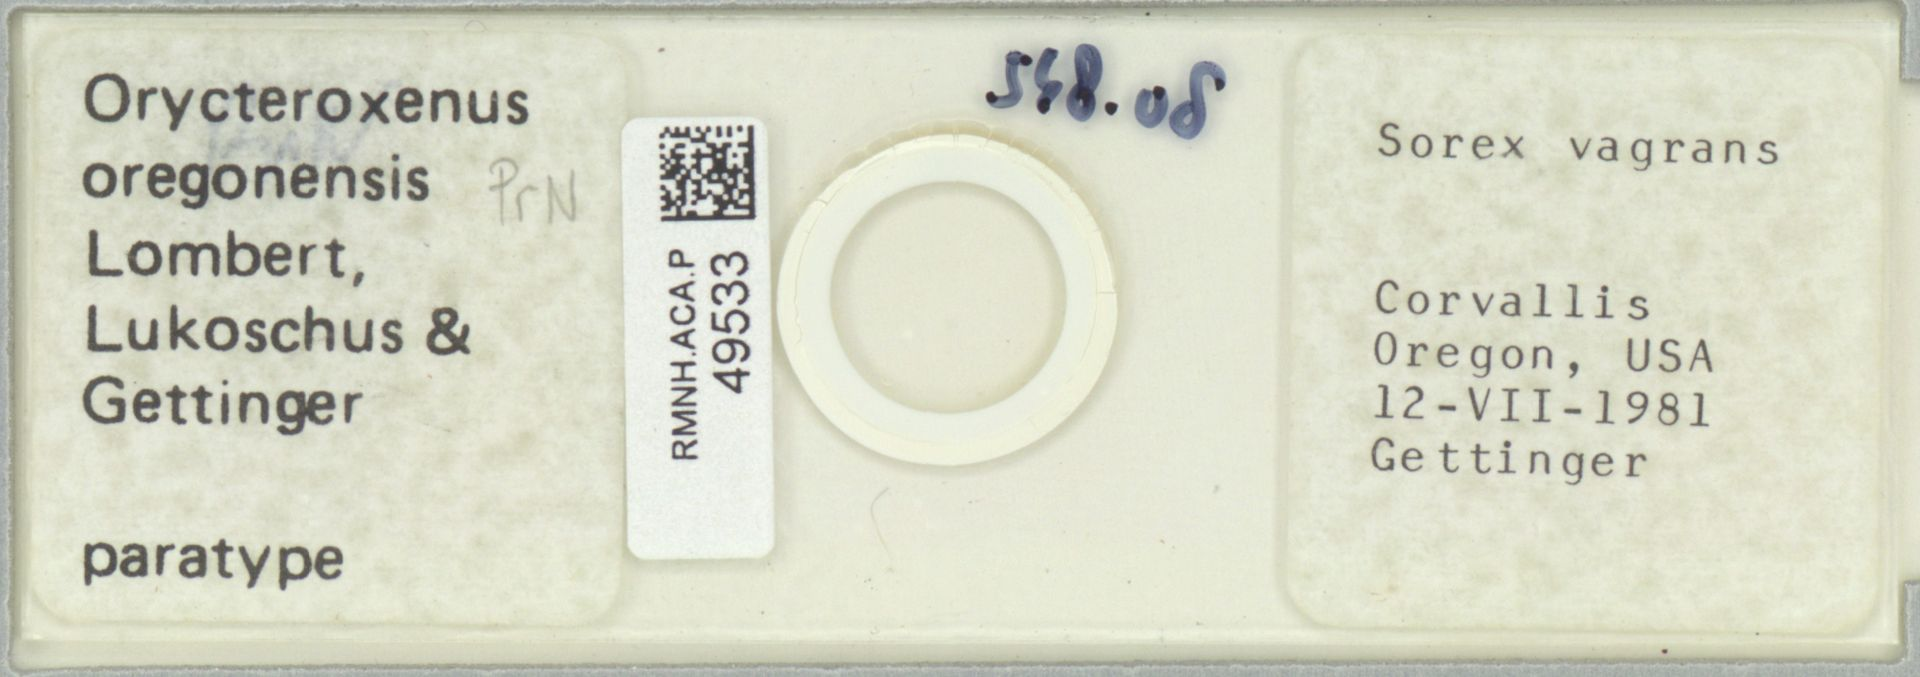 RMNH.ACA.P.49533 | Orycteroxenus oregonensis Lombert, Lukoschus & Gettinger